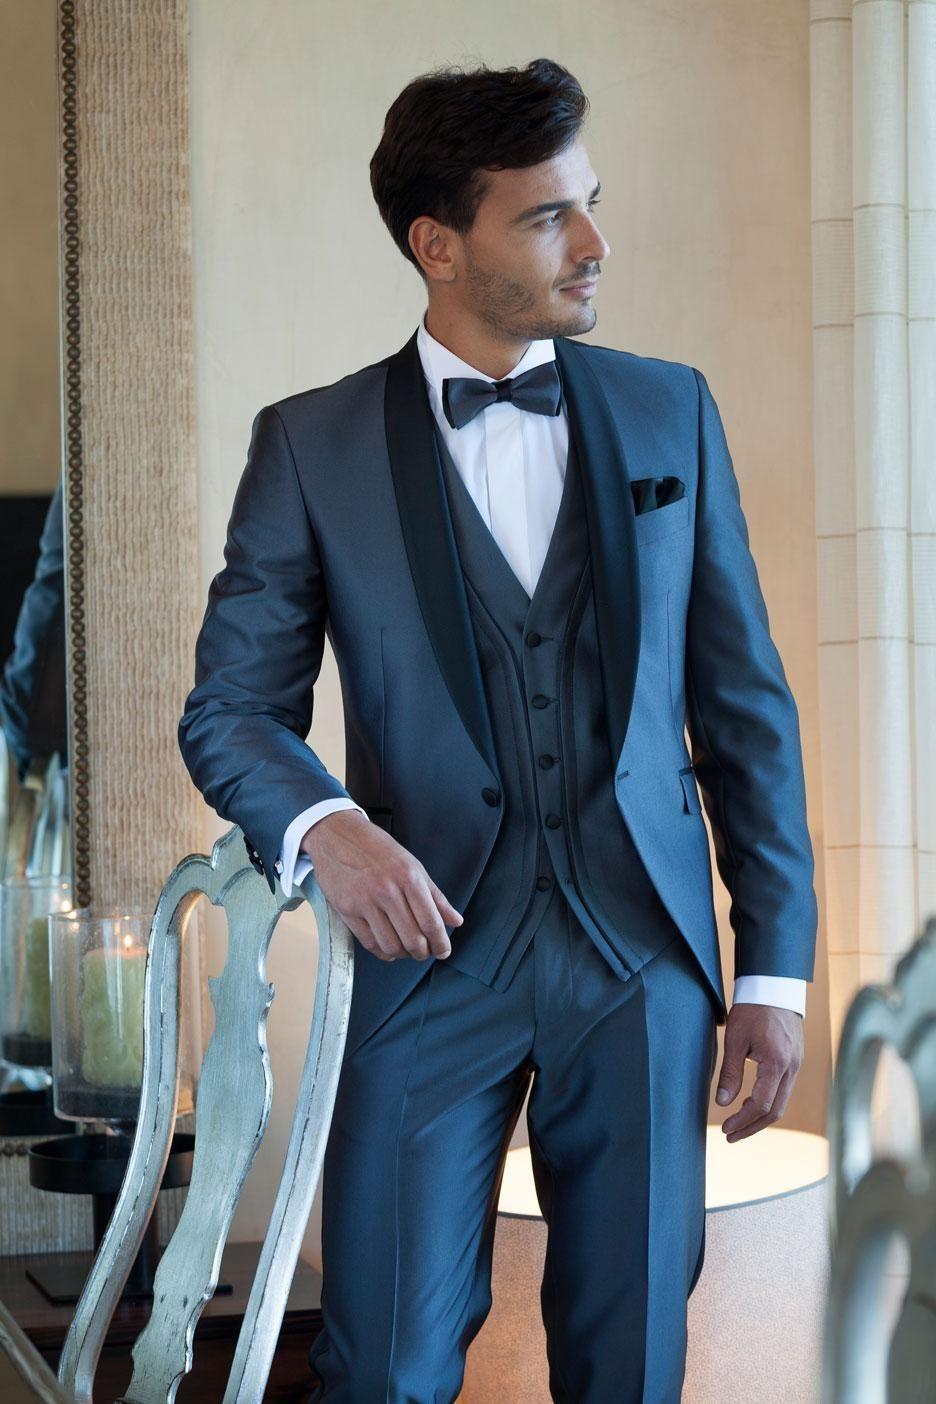 Wedding suit of the groom